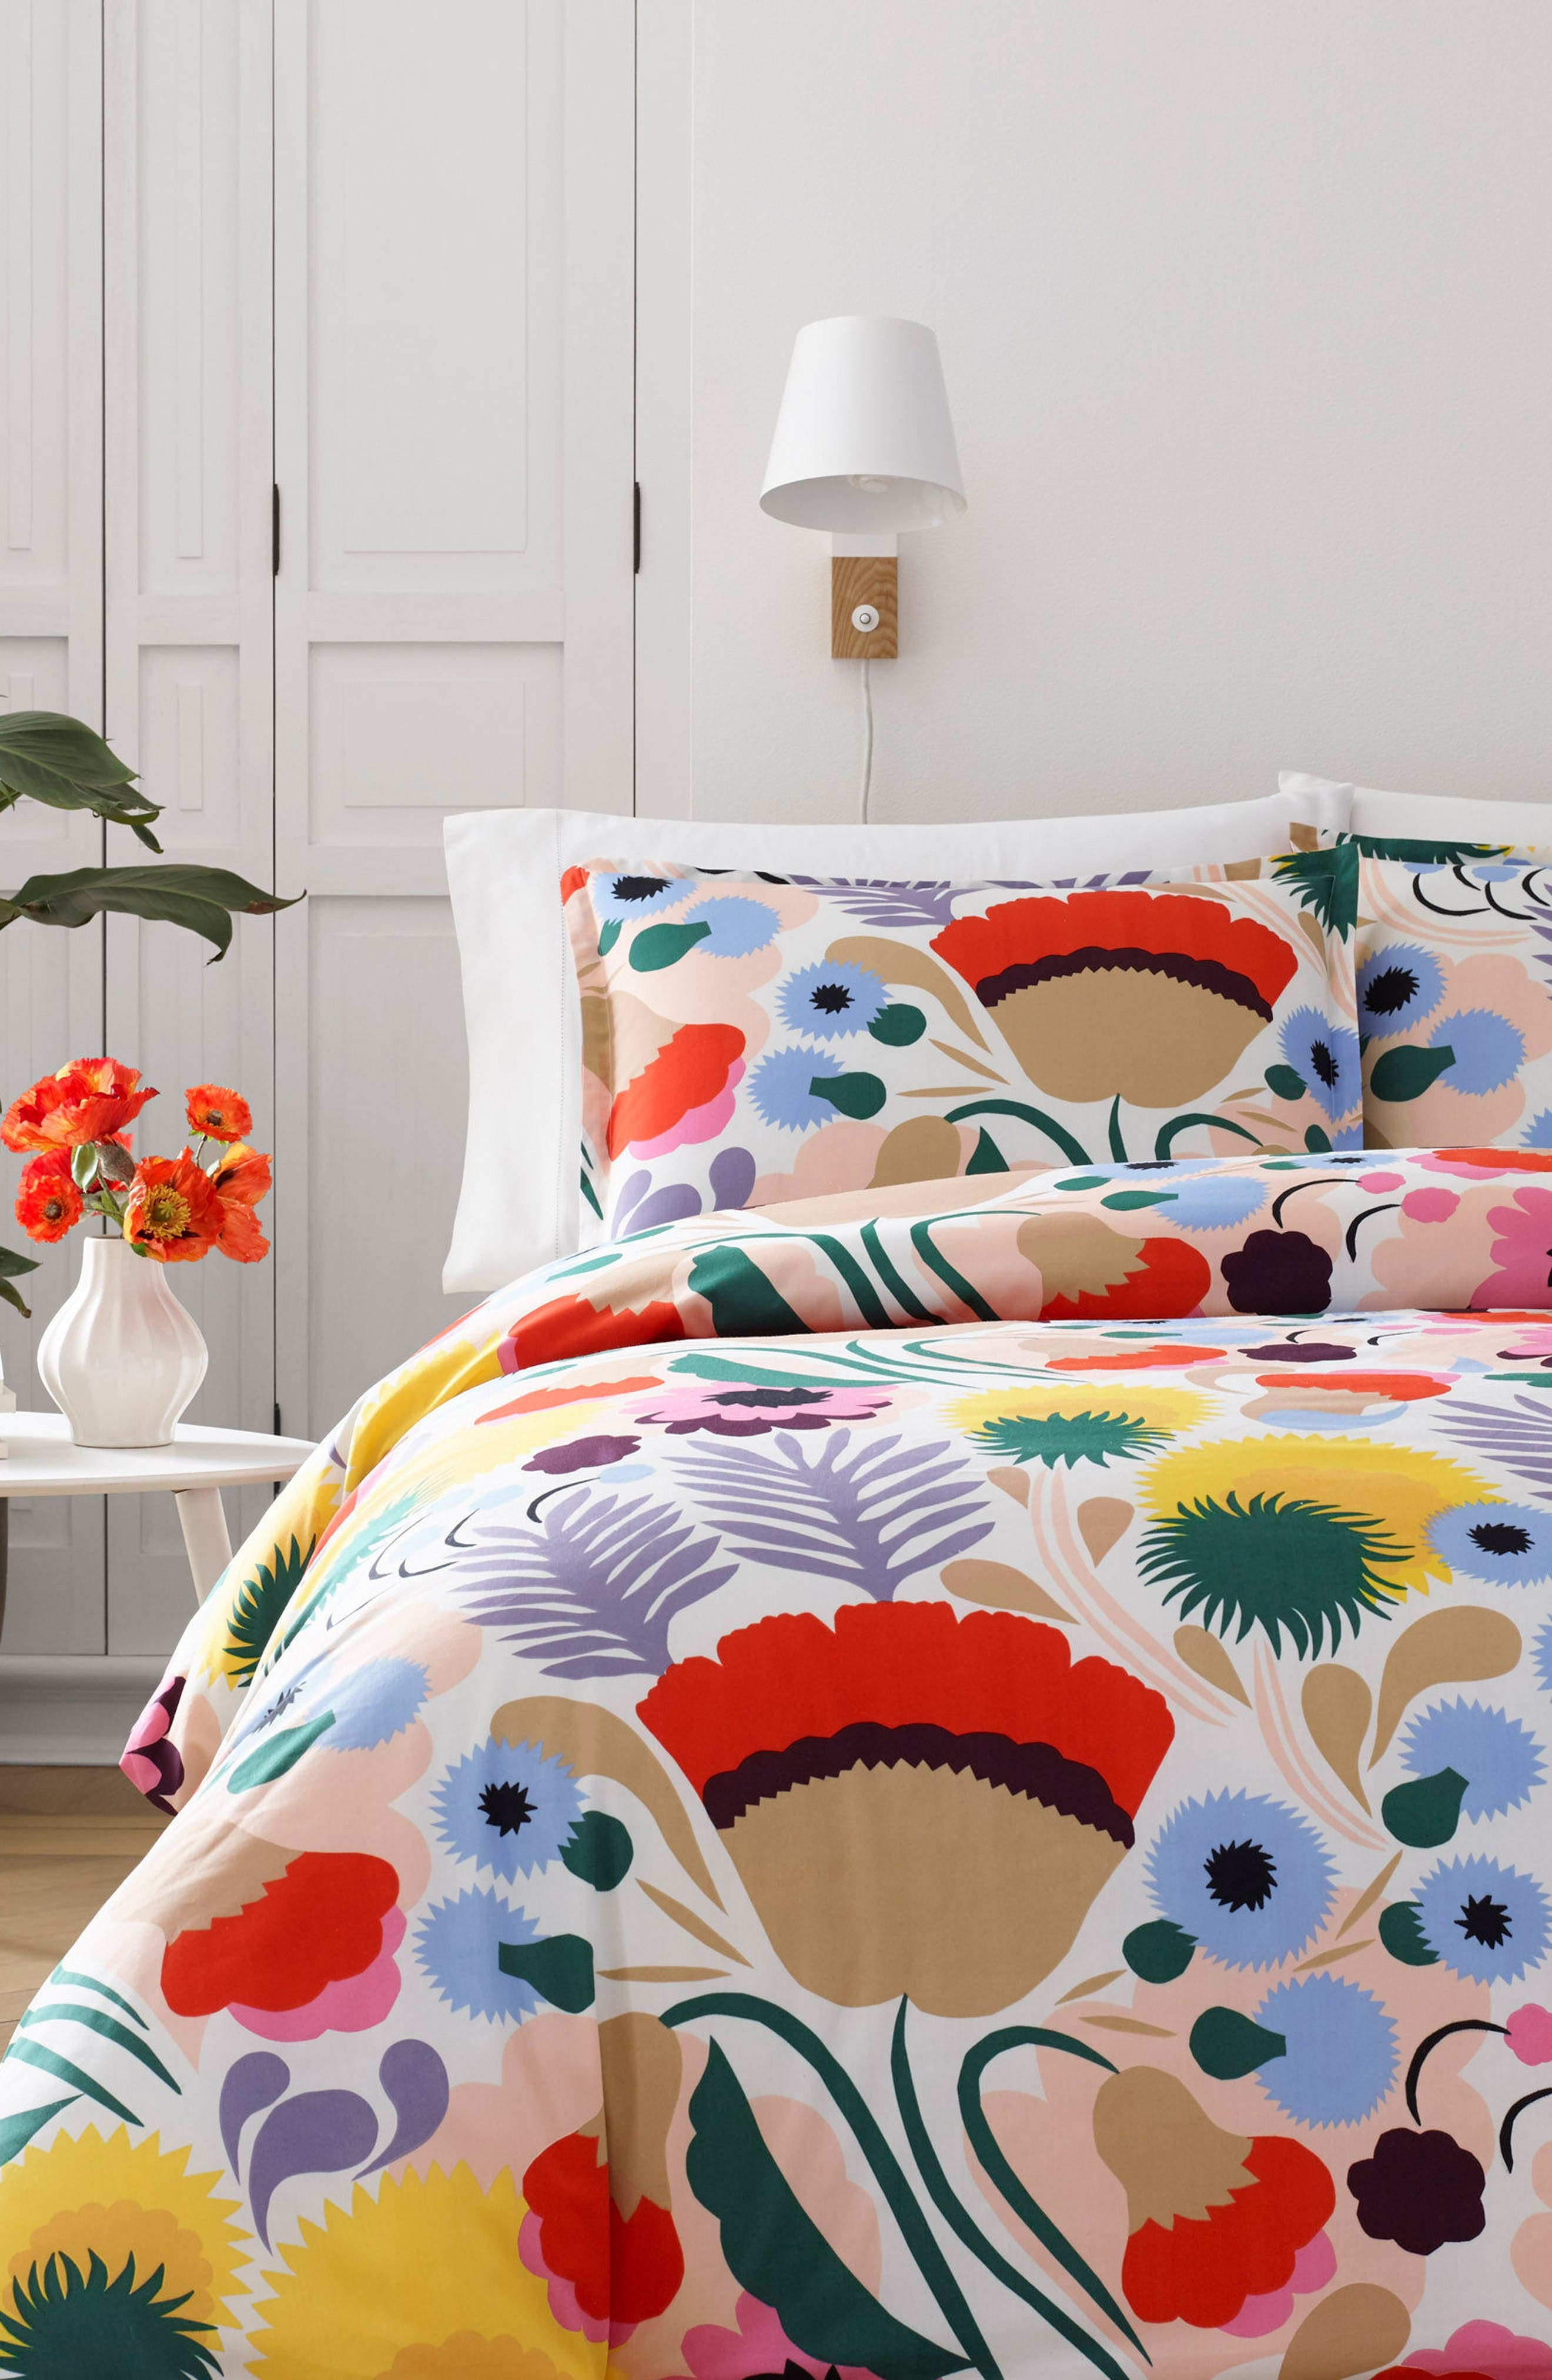 shipping today jill bed set free comforter bath groton marimekko product rosenwald swirl bedding overstock reversible